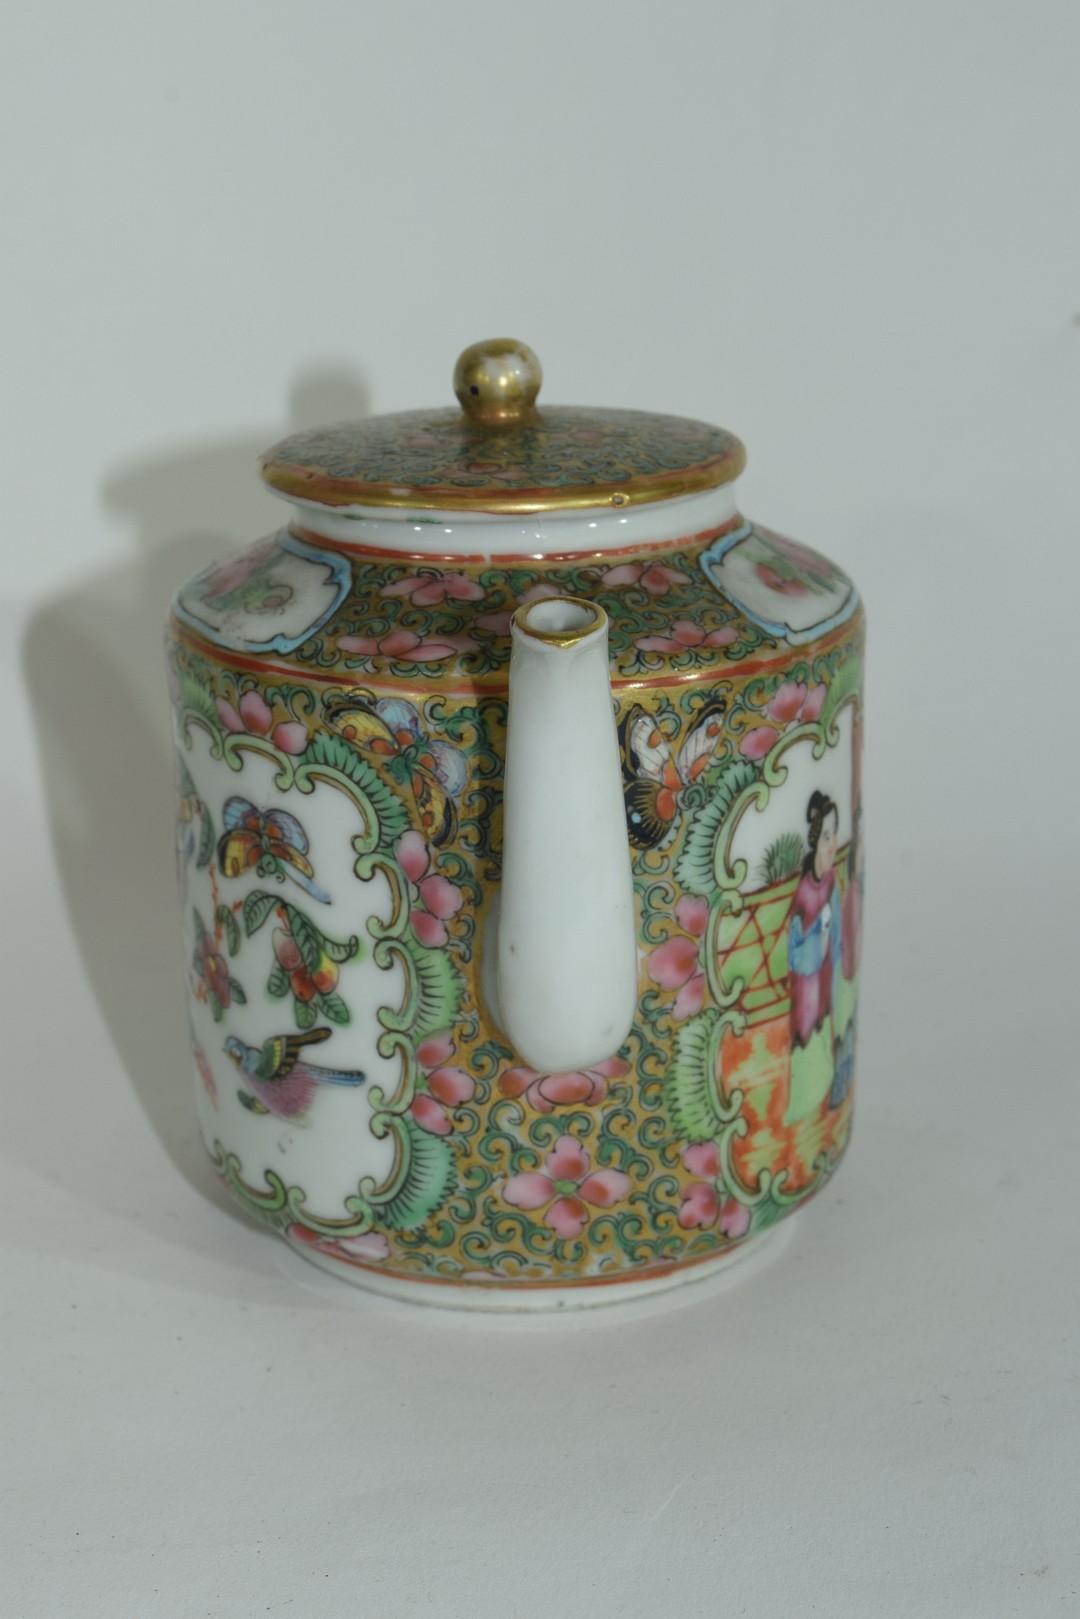 Small Cantonese porcelain tea pot - Image 4 of 7